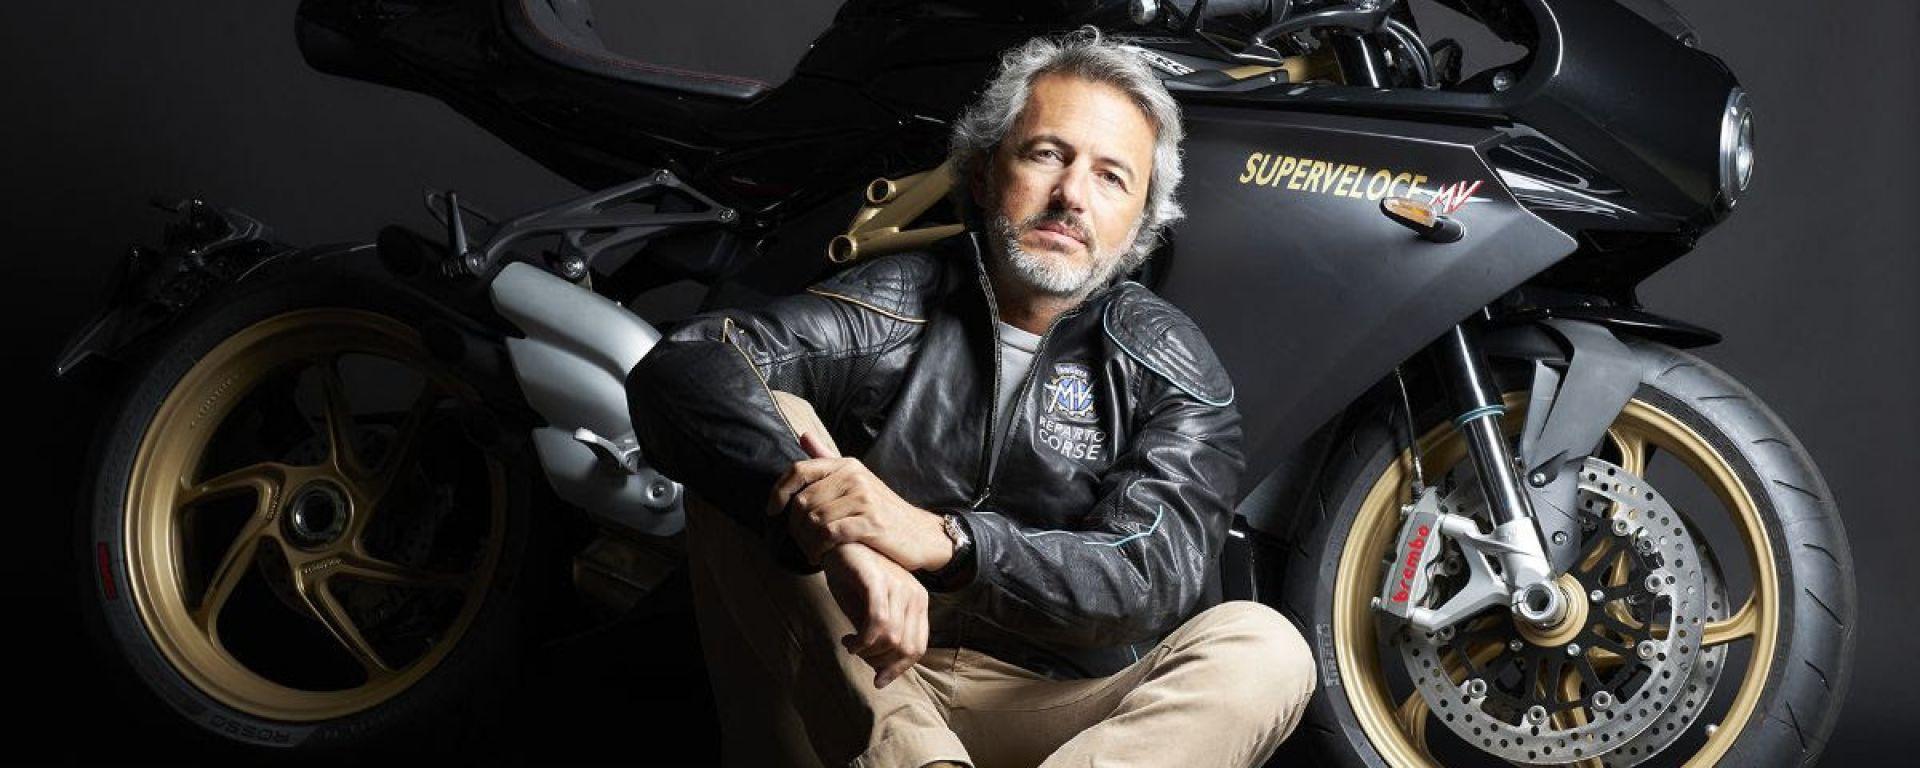 Filippo Bassoli, direttore marketing MV Agusta